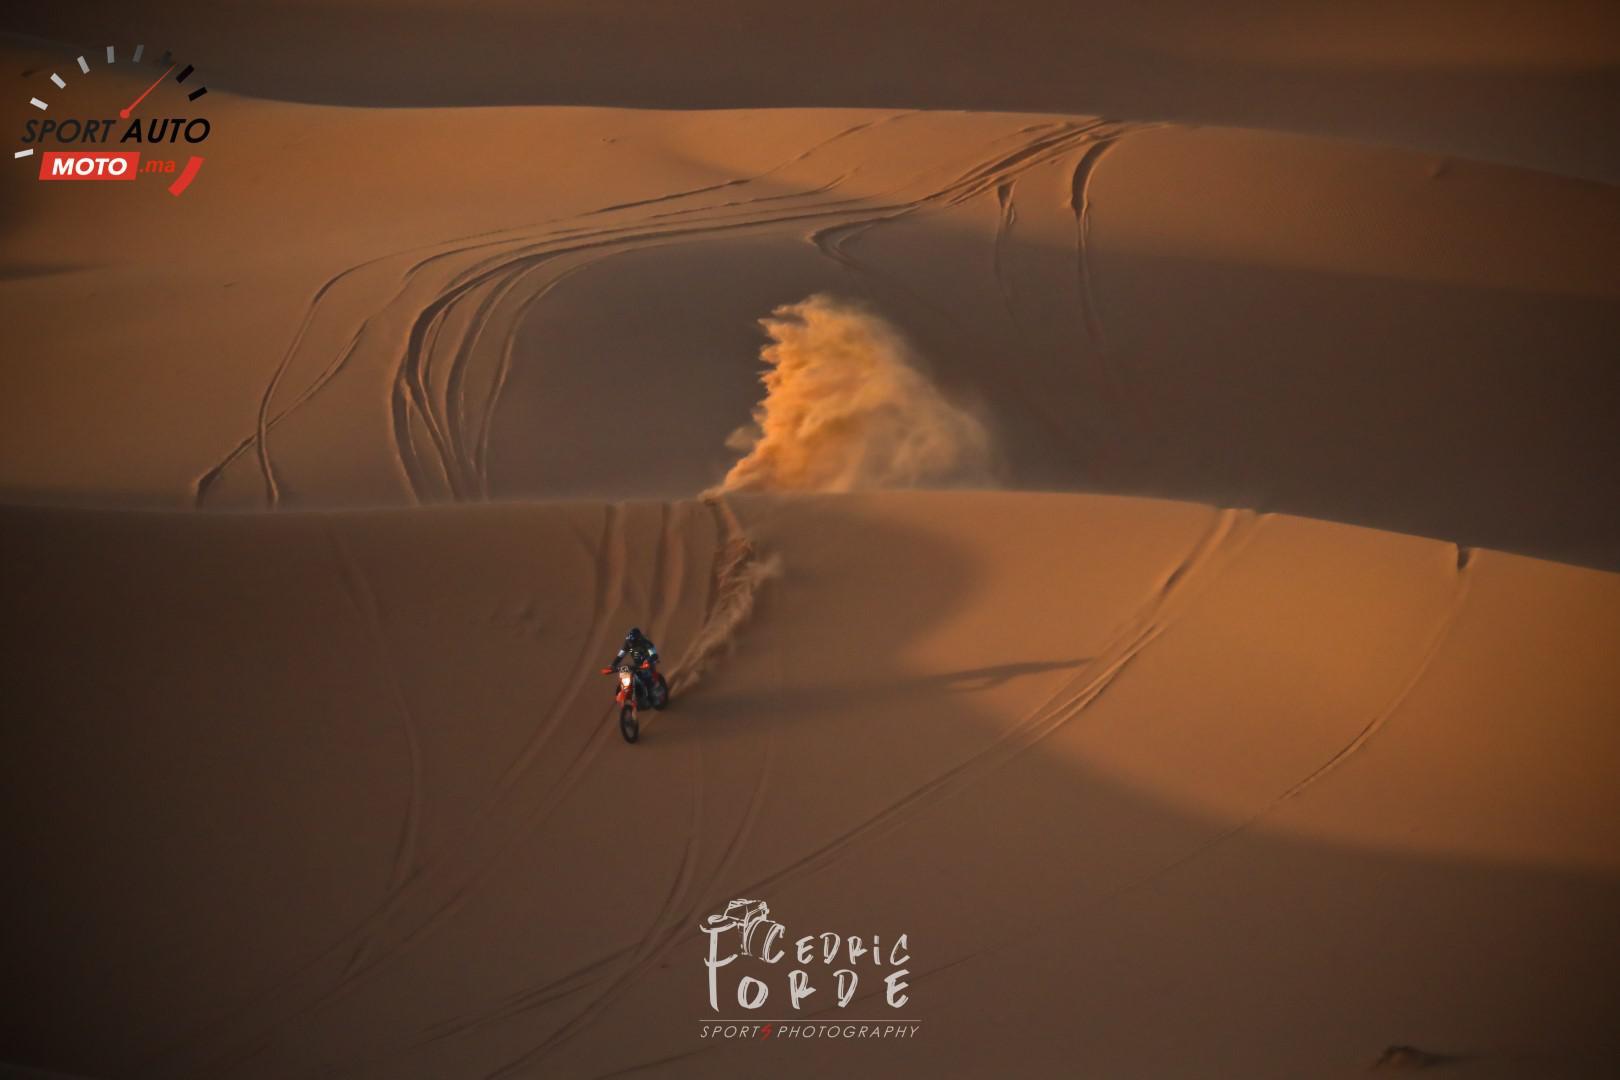 hearts-of-morocco-2018-cherednikov-et-engel-vainqueurs-sur-les-dunes-898-4.jpg